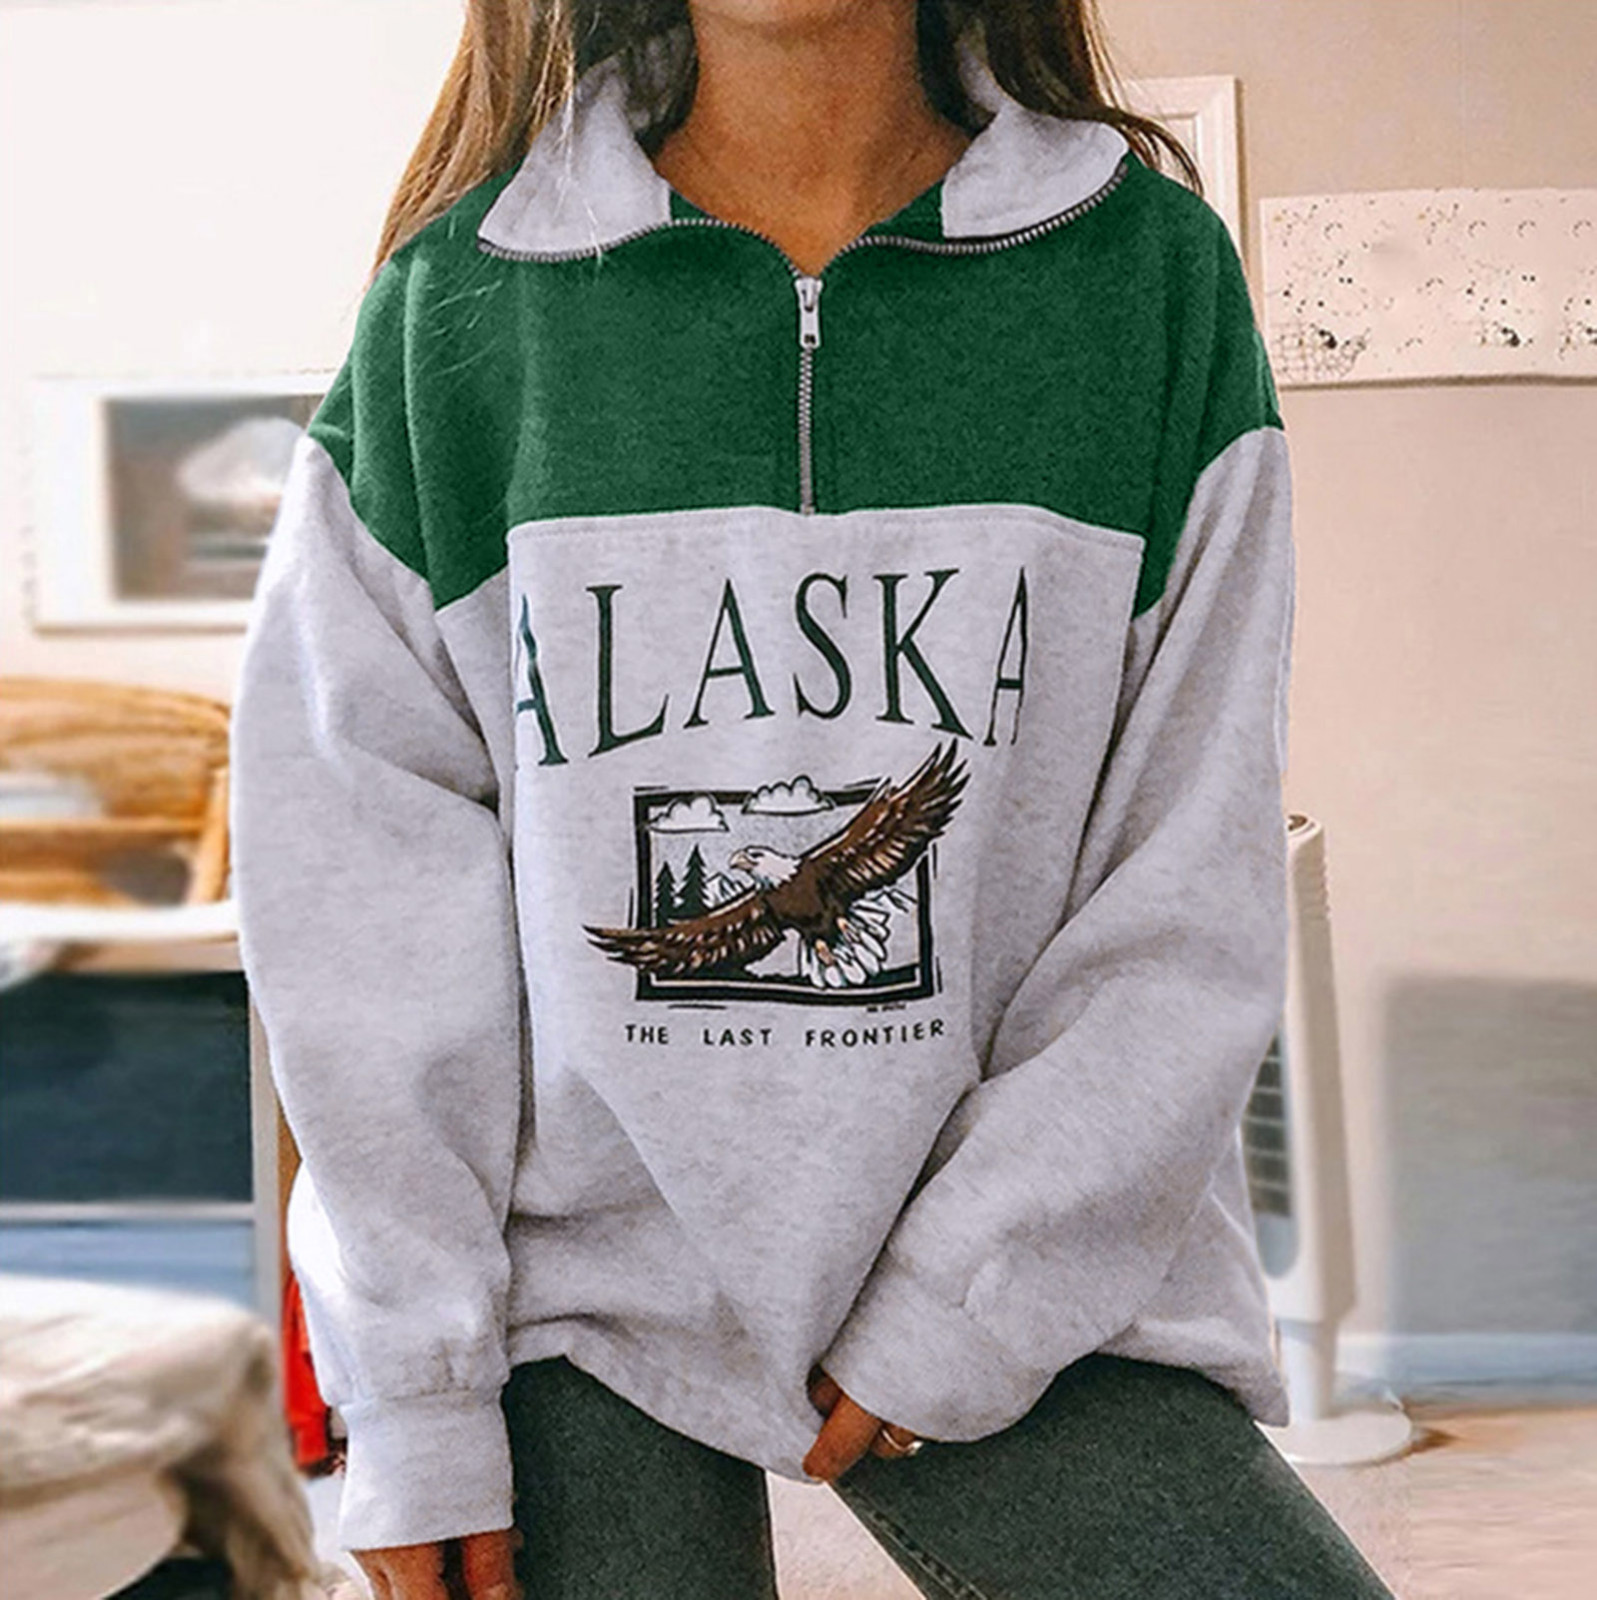 40# Women's Patchwork Hoodies tops Casual Long Sleeve Printed Zipper Long Sleeve Sweatshirts Tops Letter Vintage Sweatshirts топ